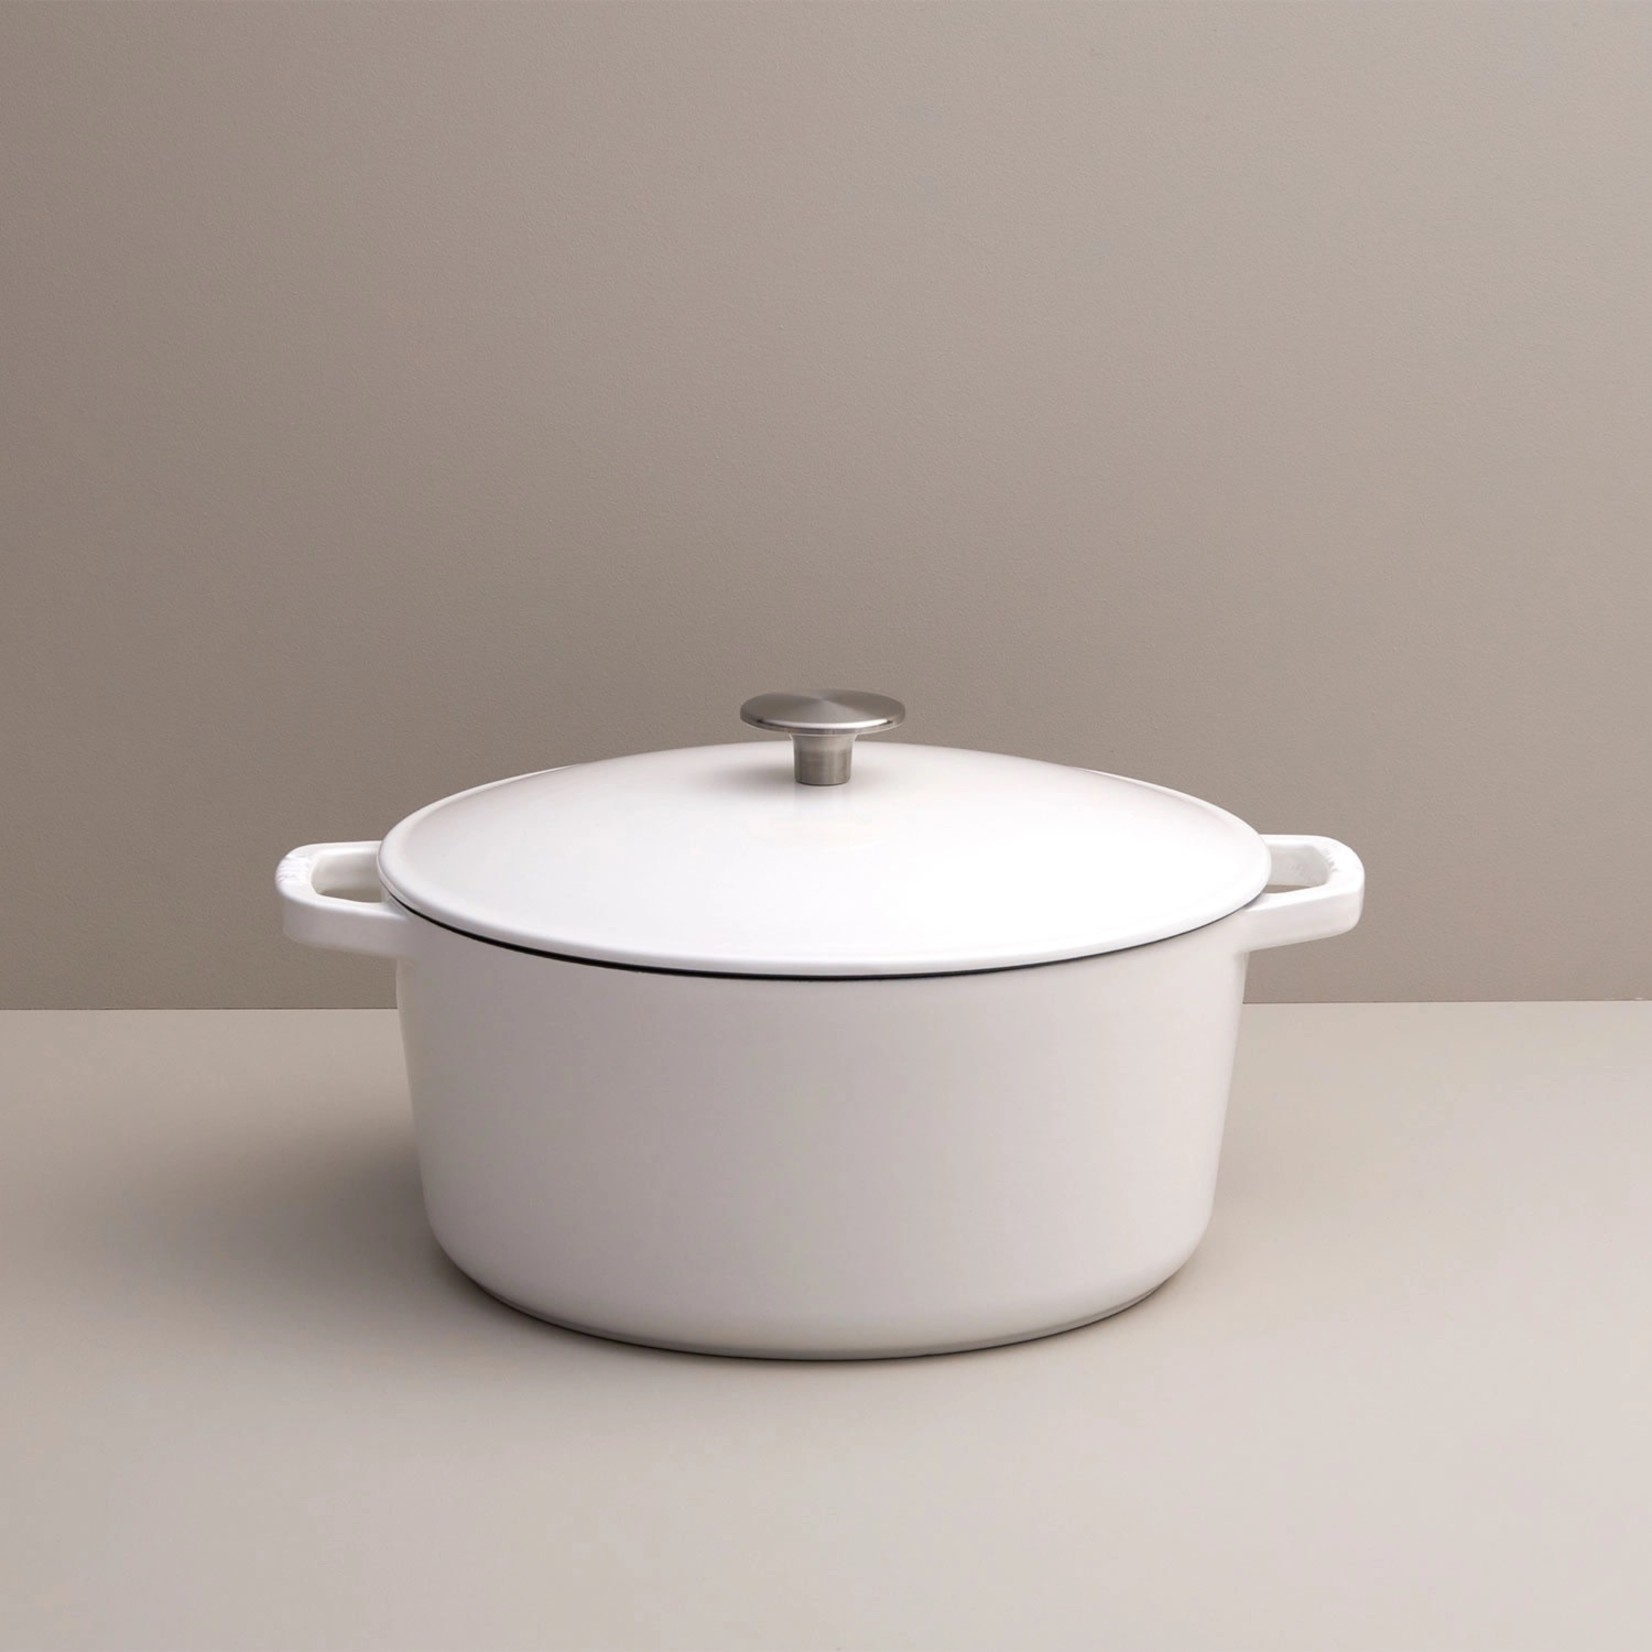 Milo 5.5Q Mini Dutch Oven in White